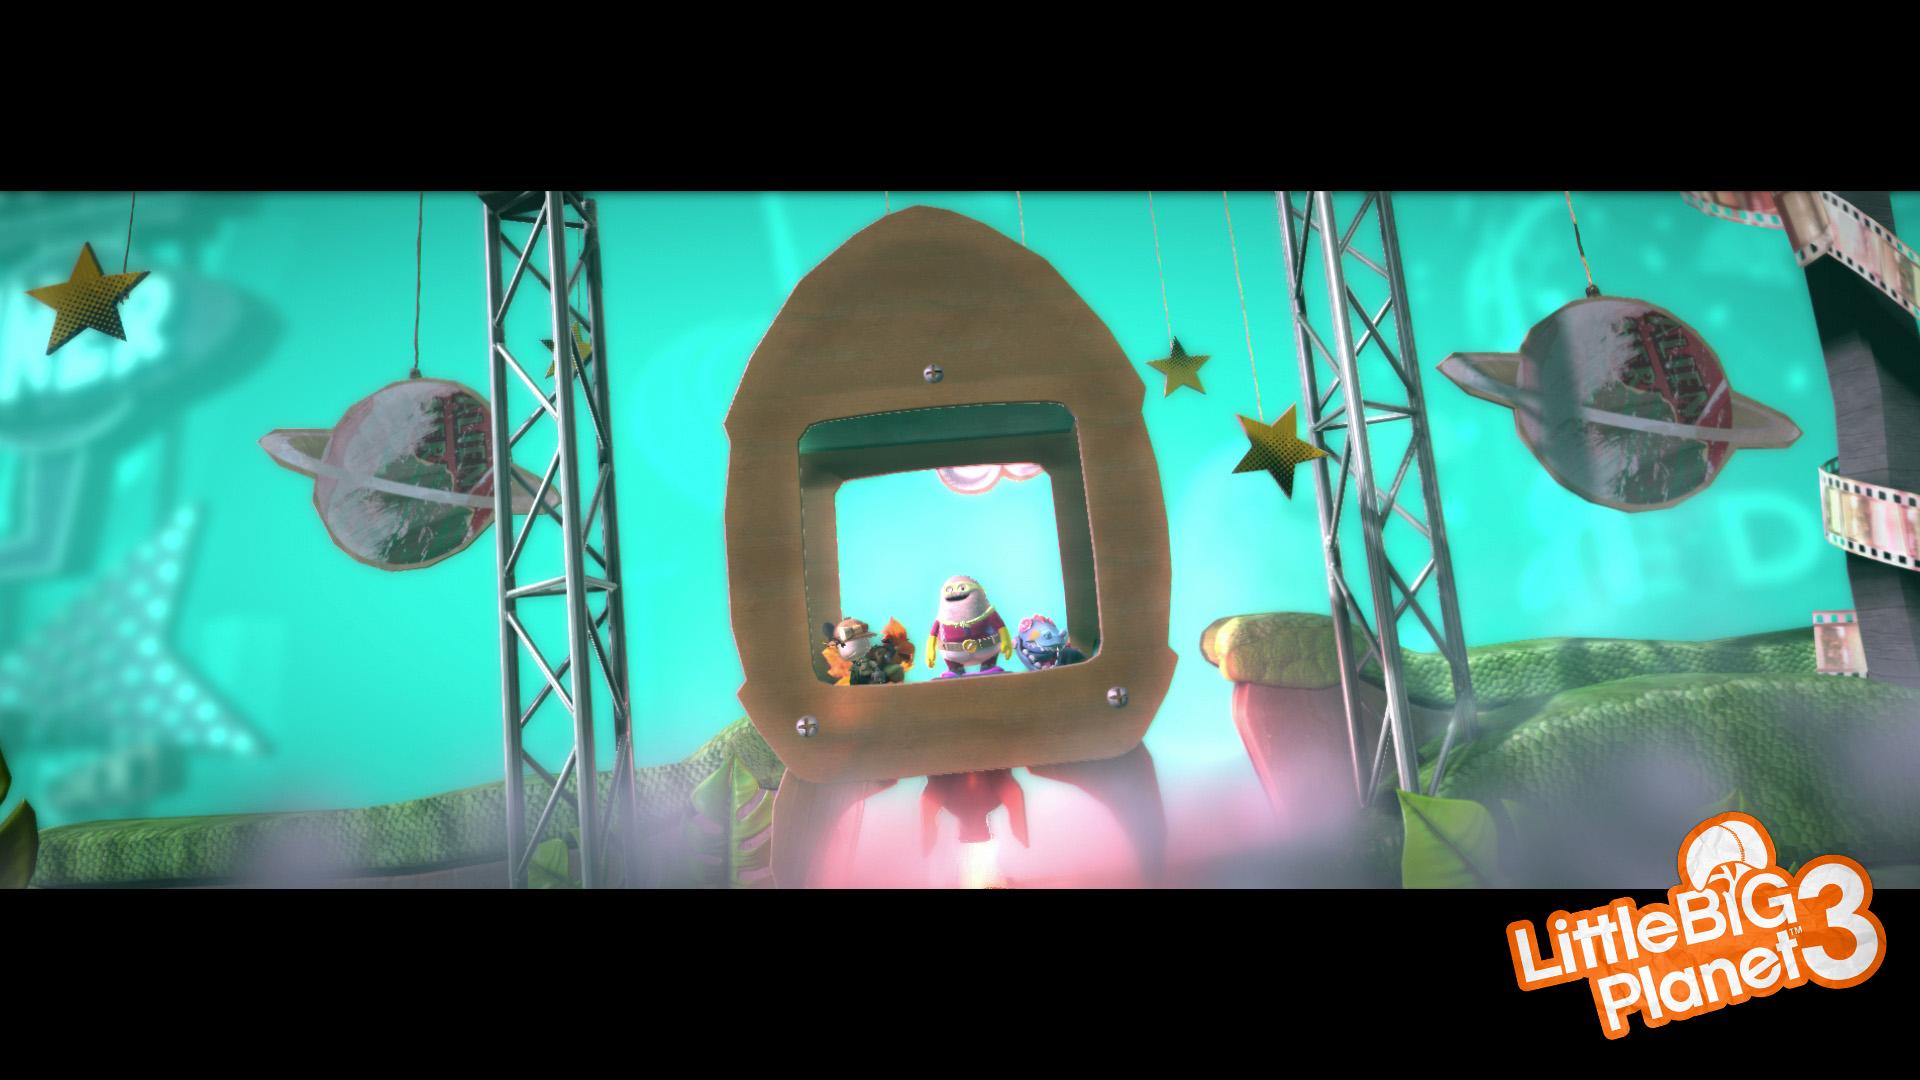 LittleBigPlanet3 PS4 Editeur 023